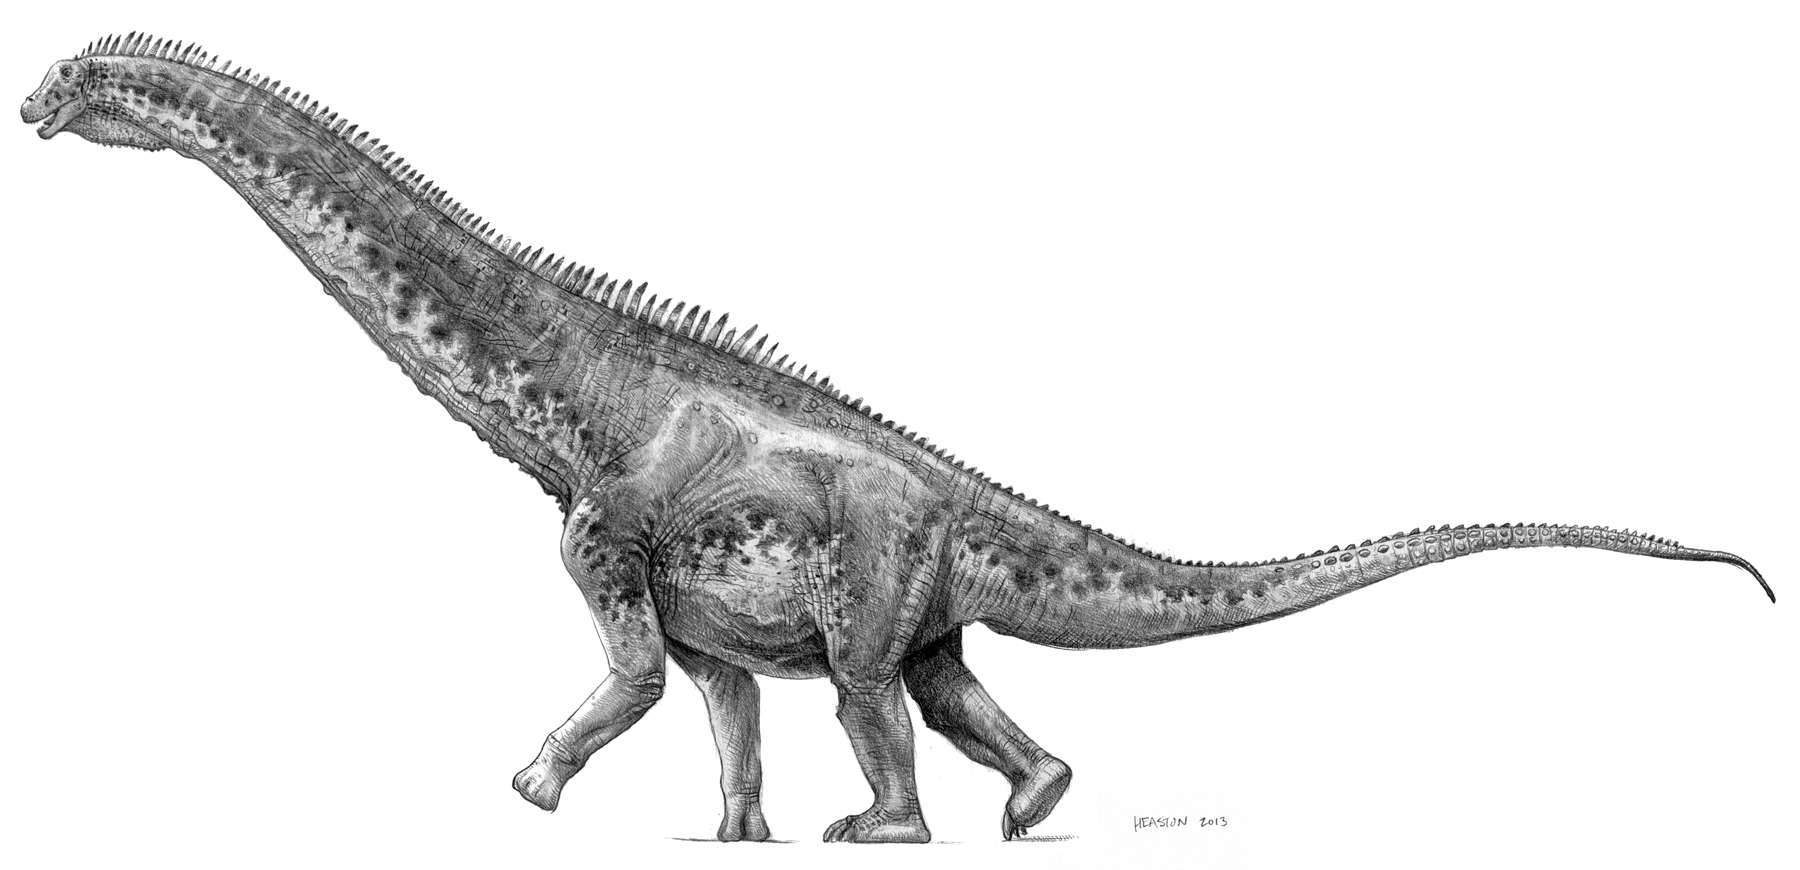 Cottonwood lizard (Alamosaurus) by pheaston